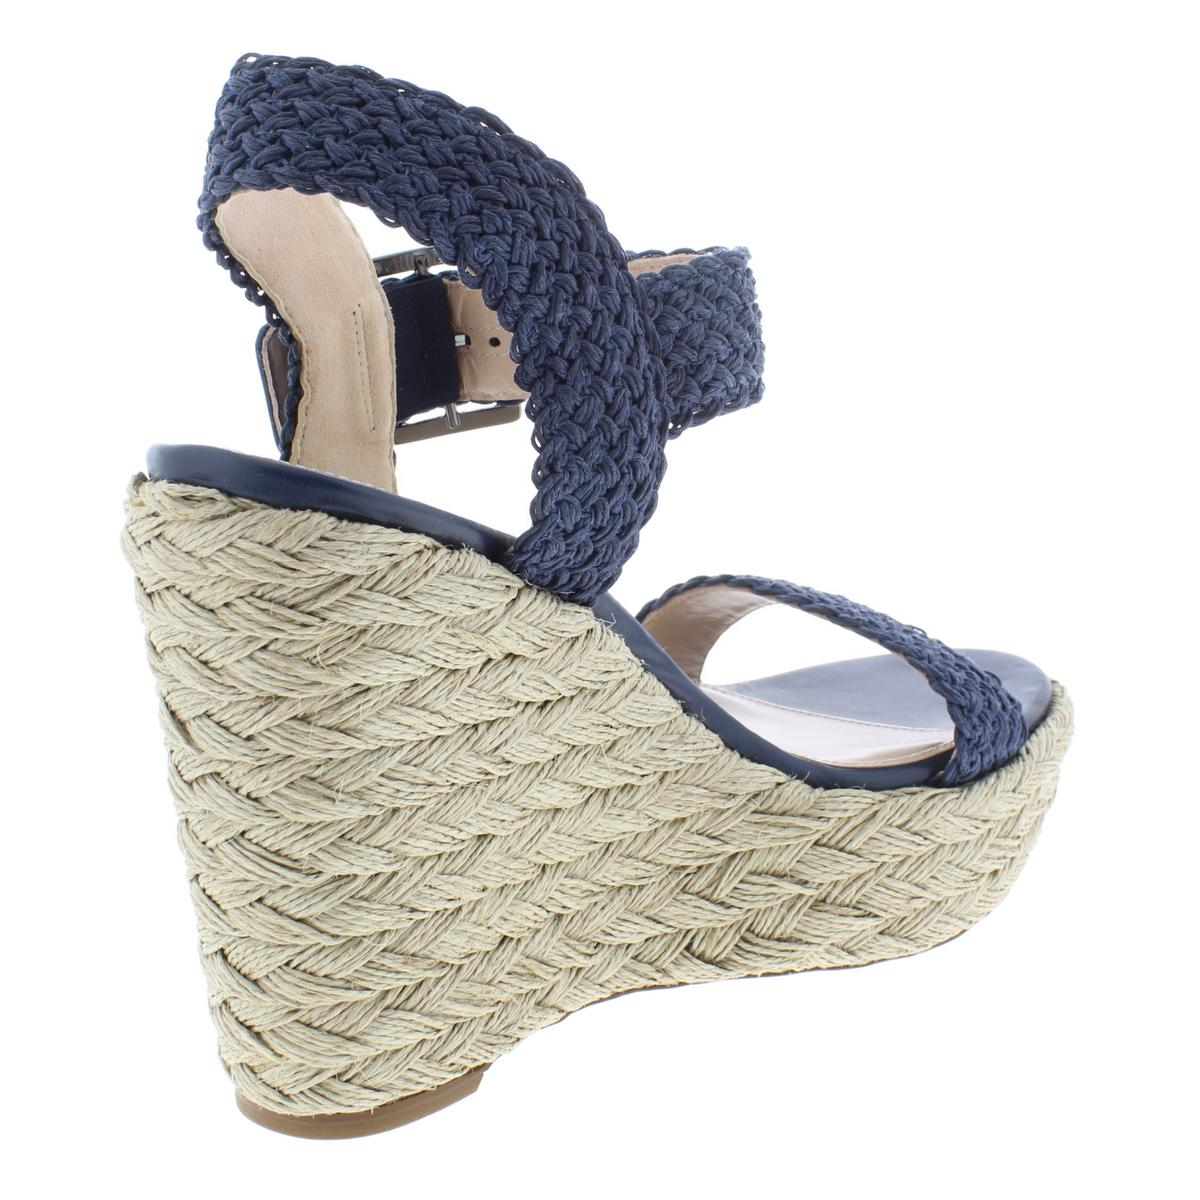 Stuart-Weitzman-Womens-Alexis-Espadrille-Platform-Wedge-Sandals-Shoes-BHFO-7914 thumbnail 4